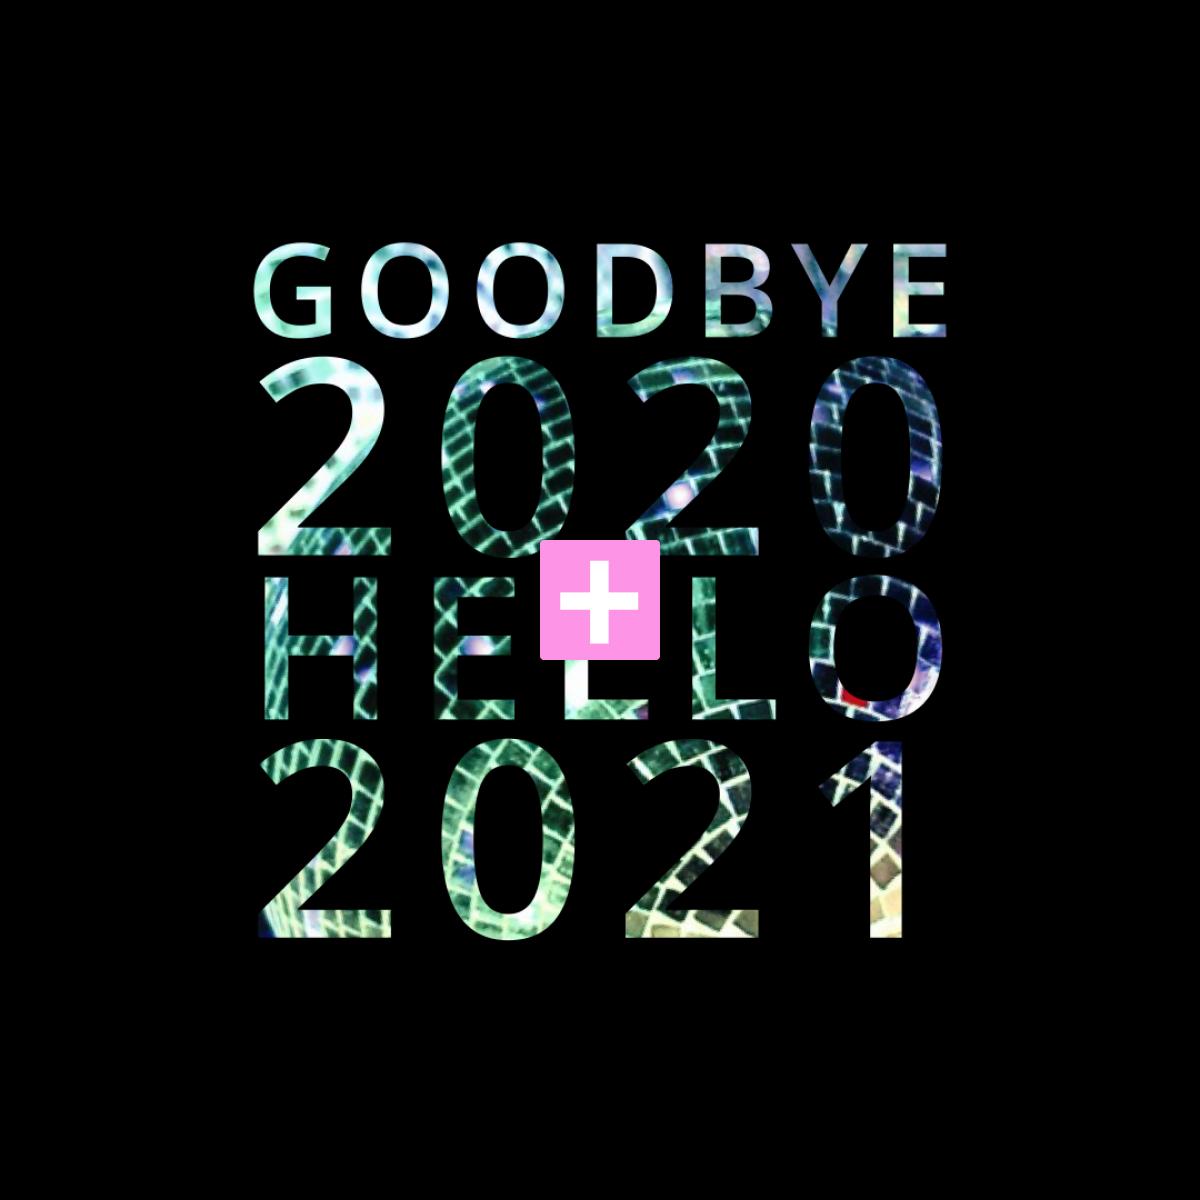 goodbyeblog.jpg